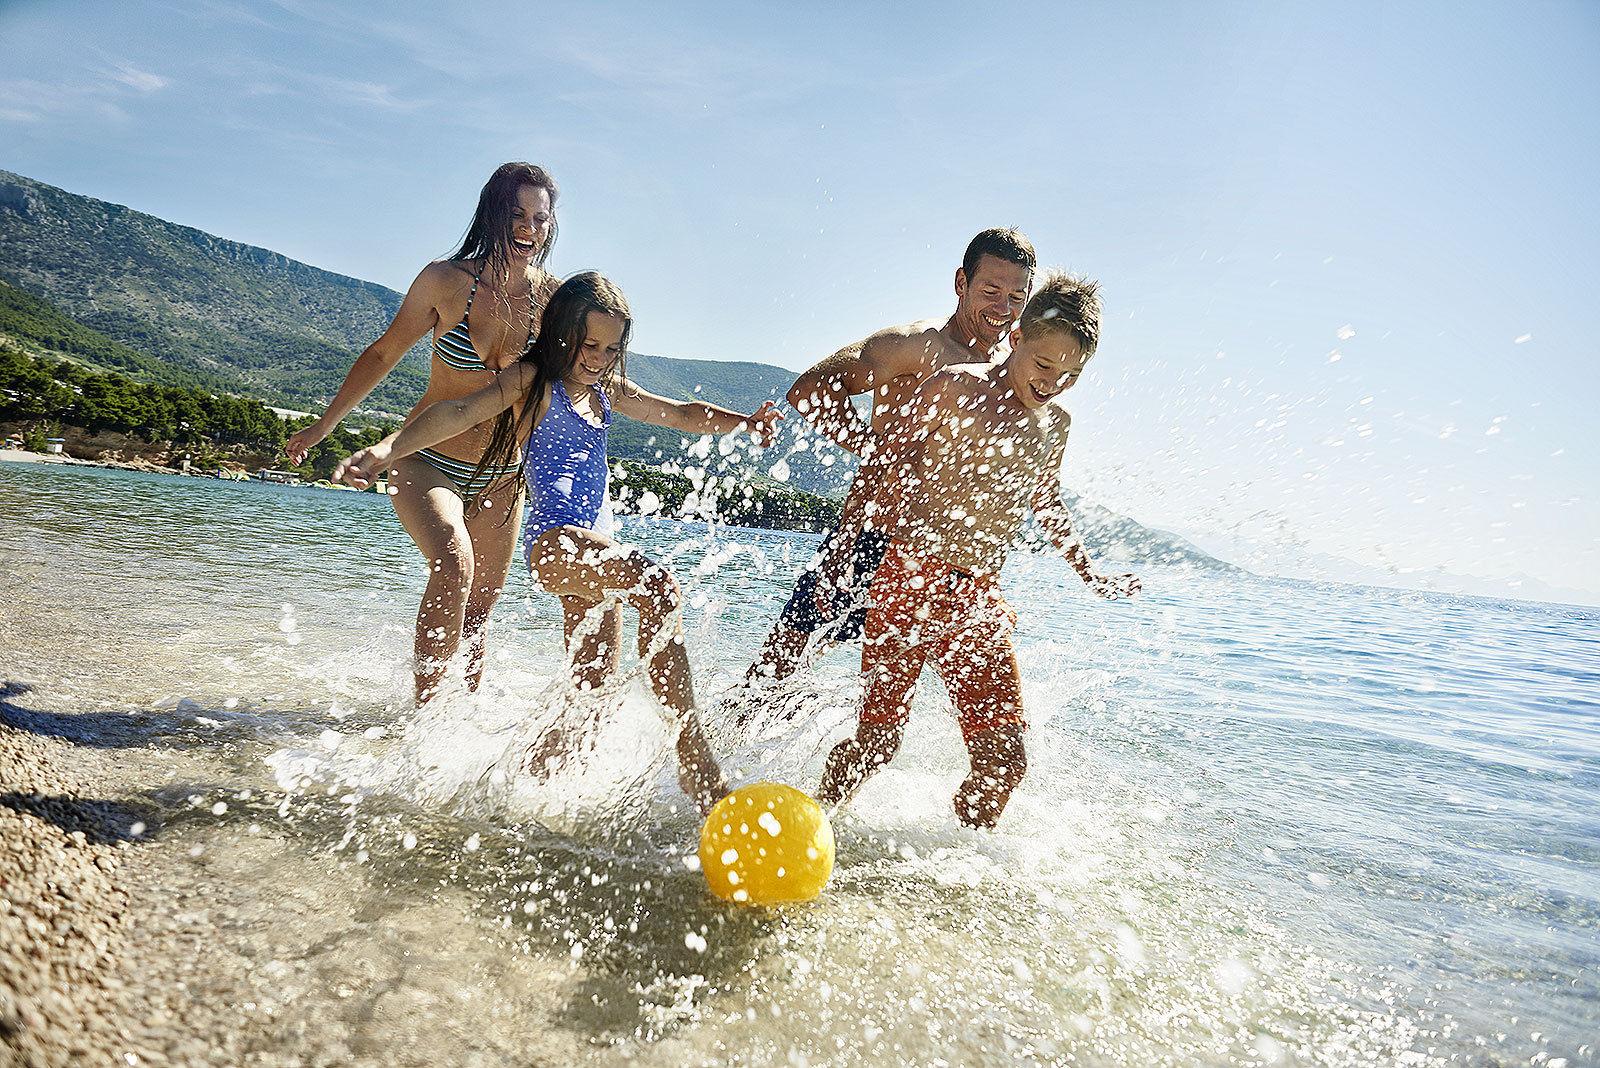 Croatia Tourism